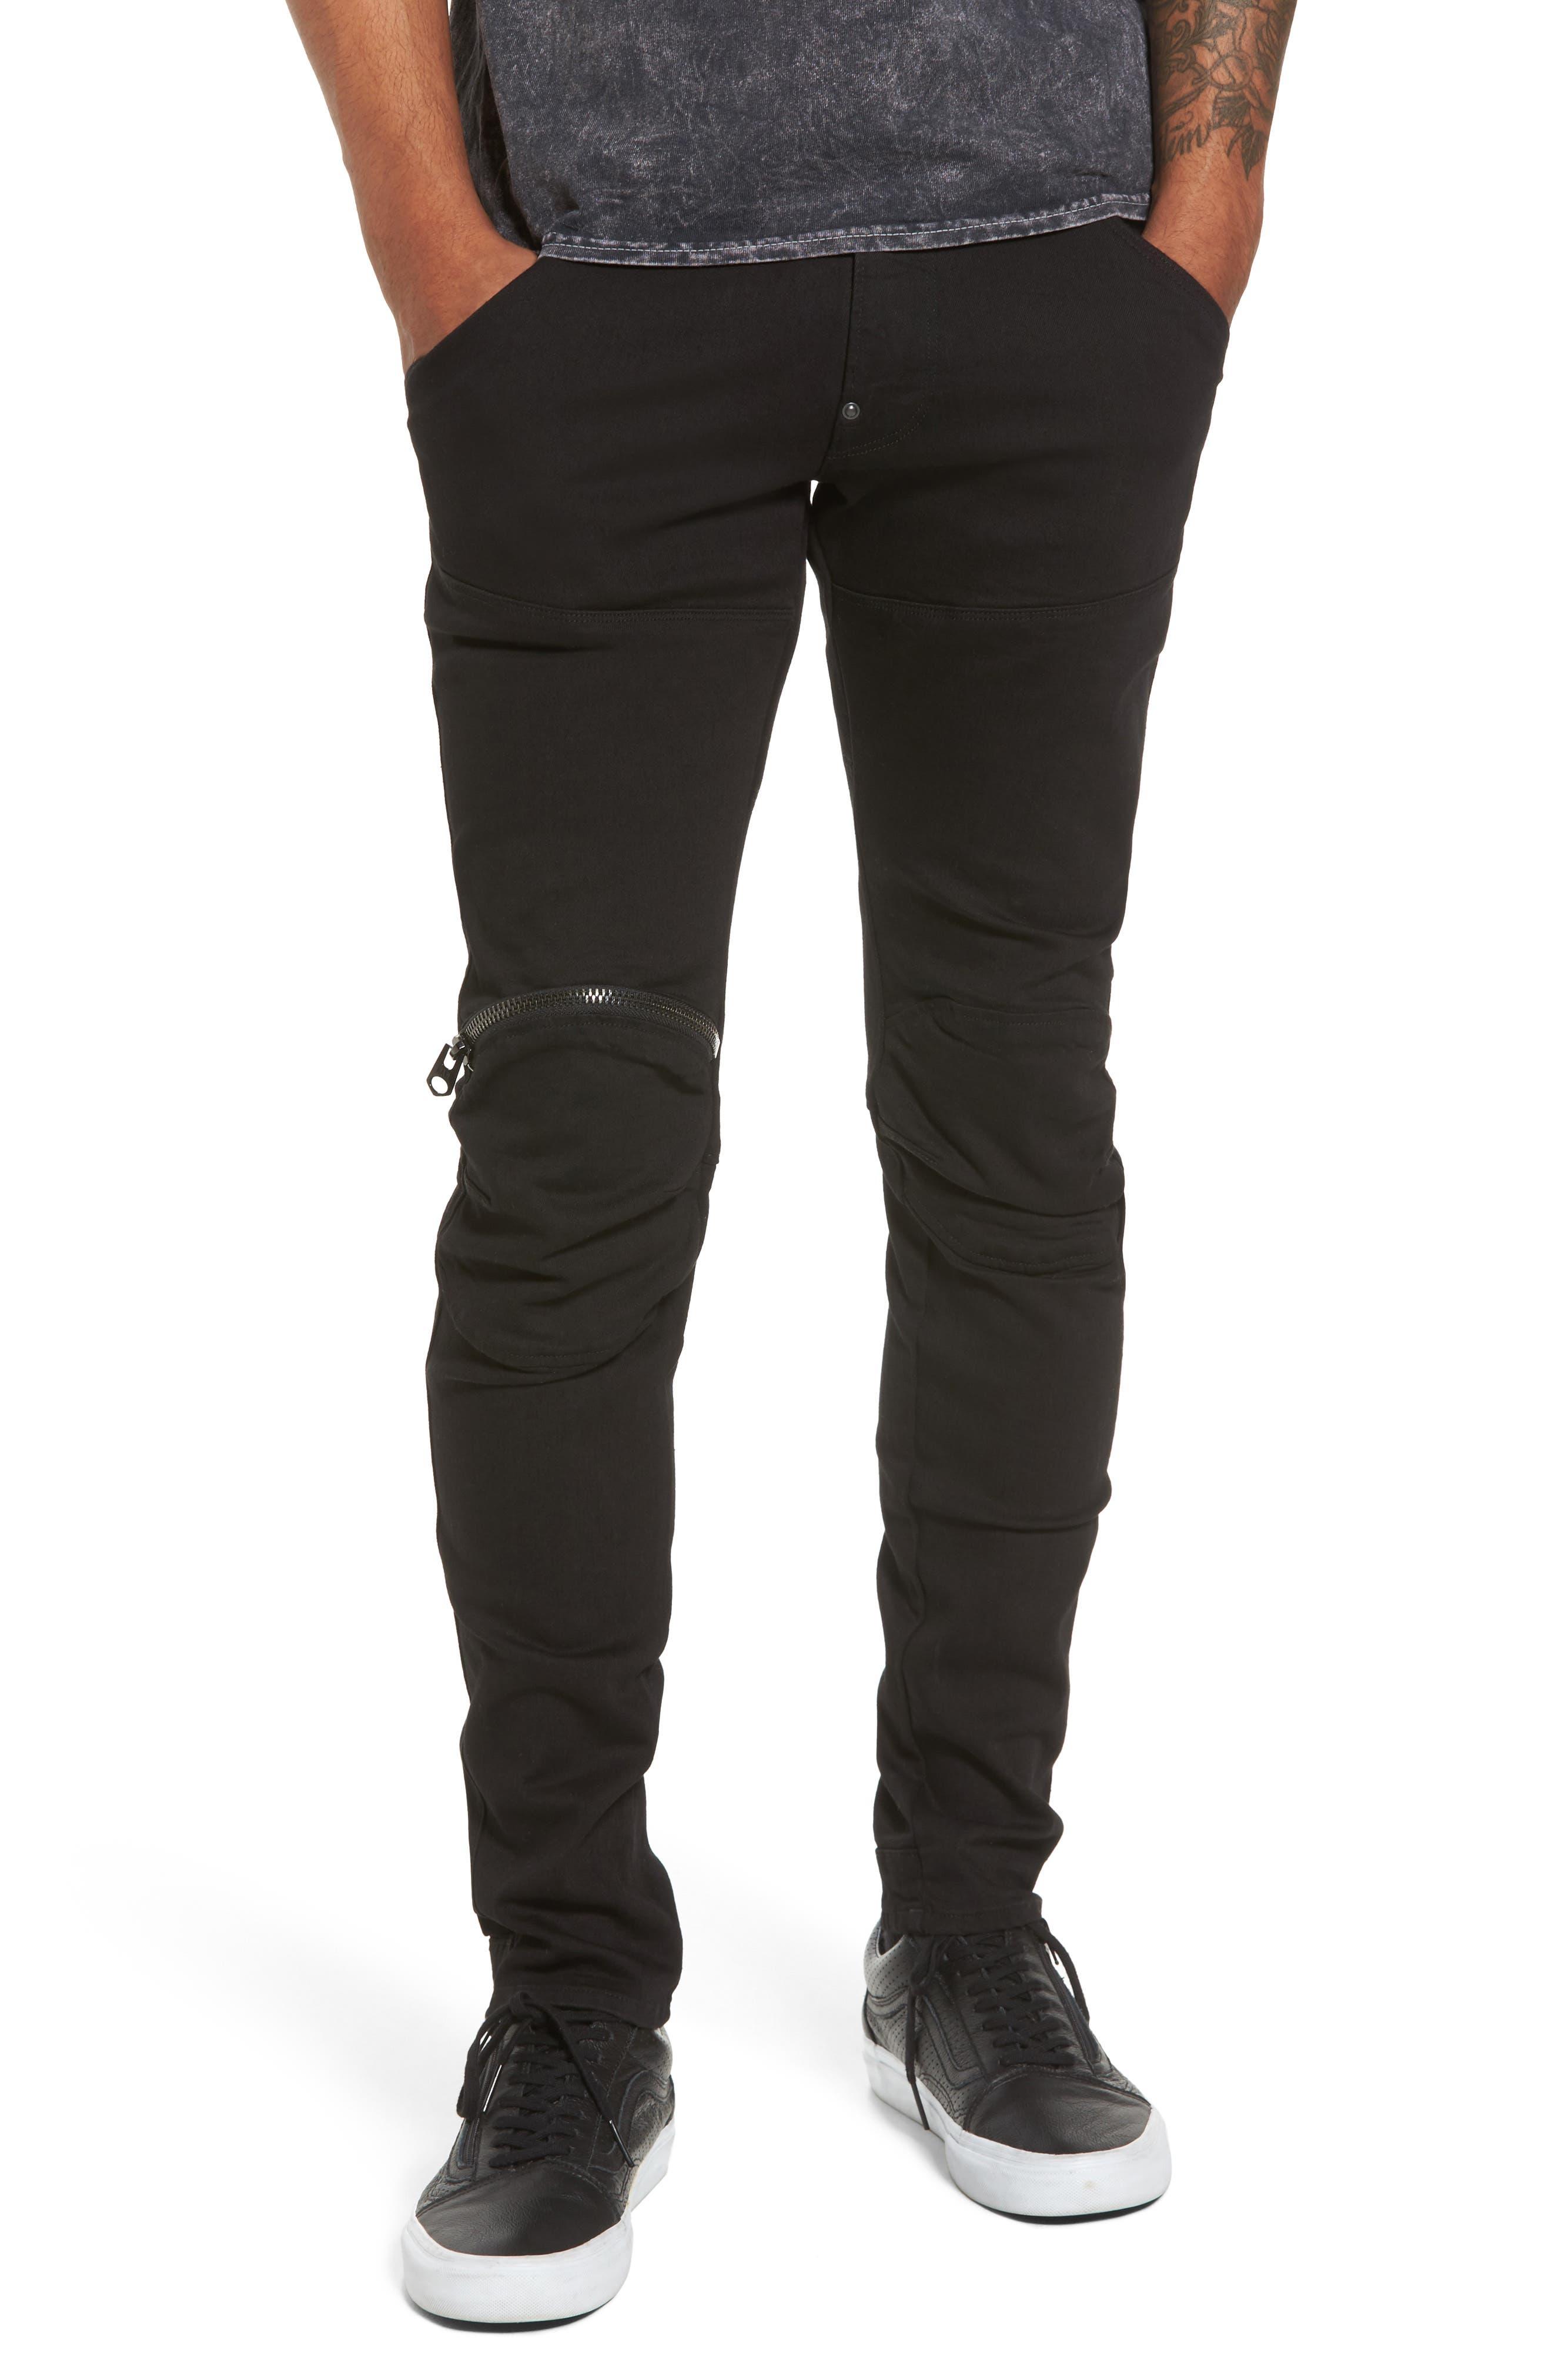 3D Zip Knee Super Slim Pants,                             Main thumbnail 1, color,                             001